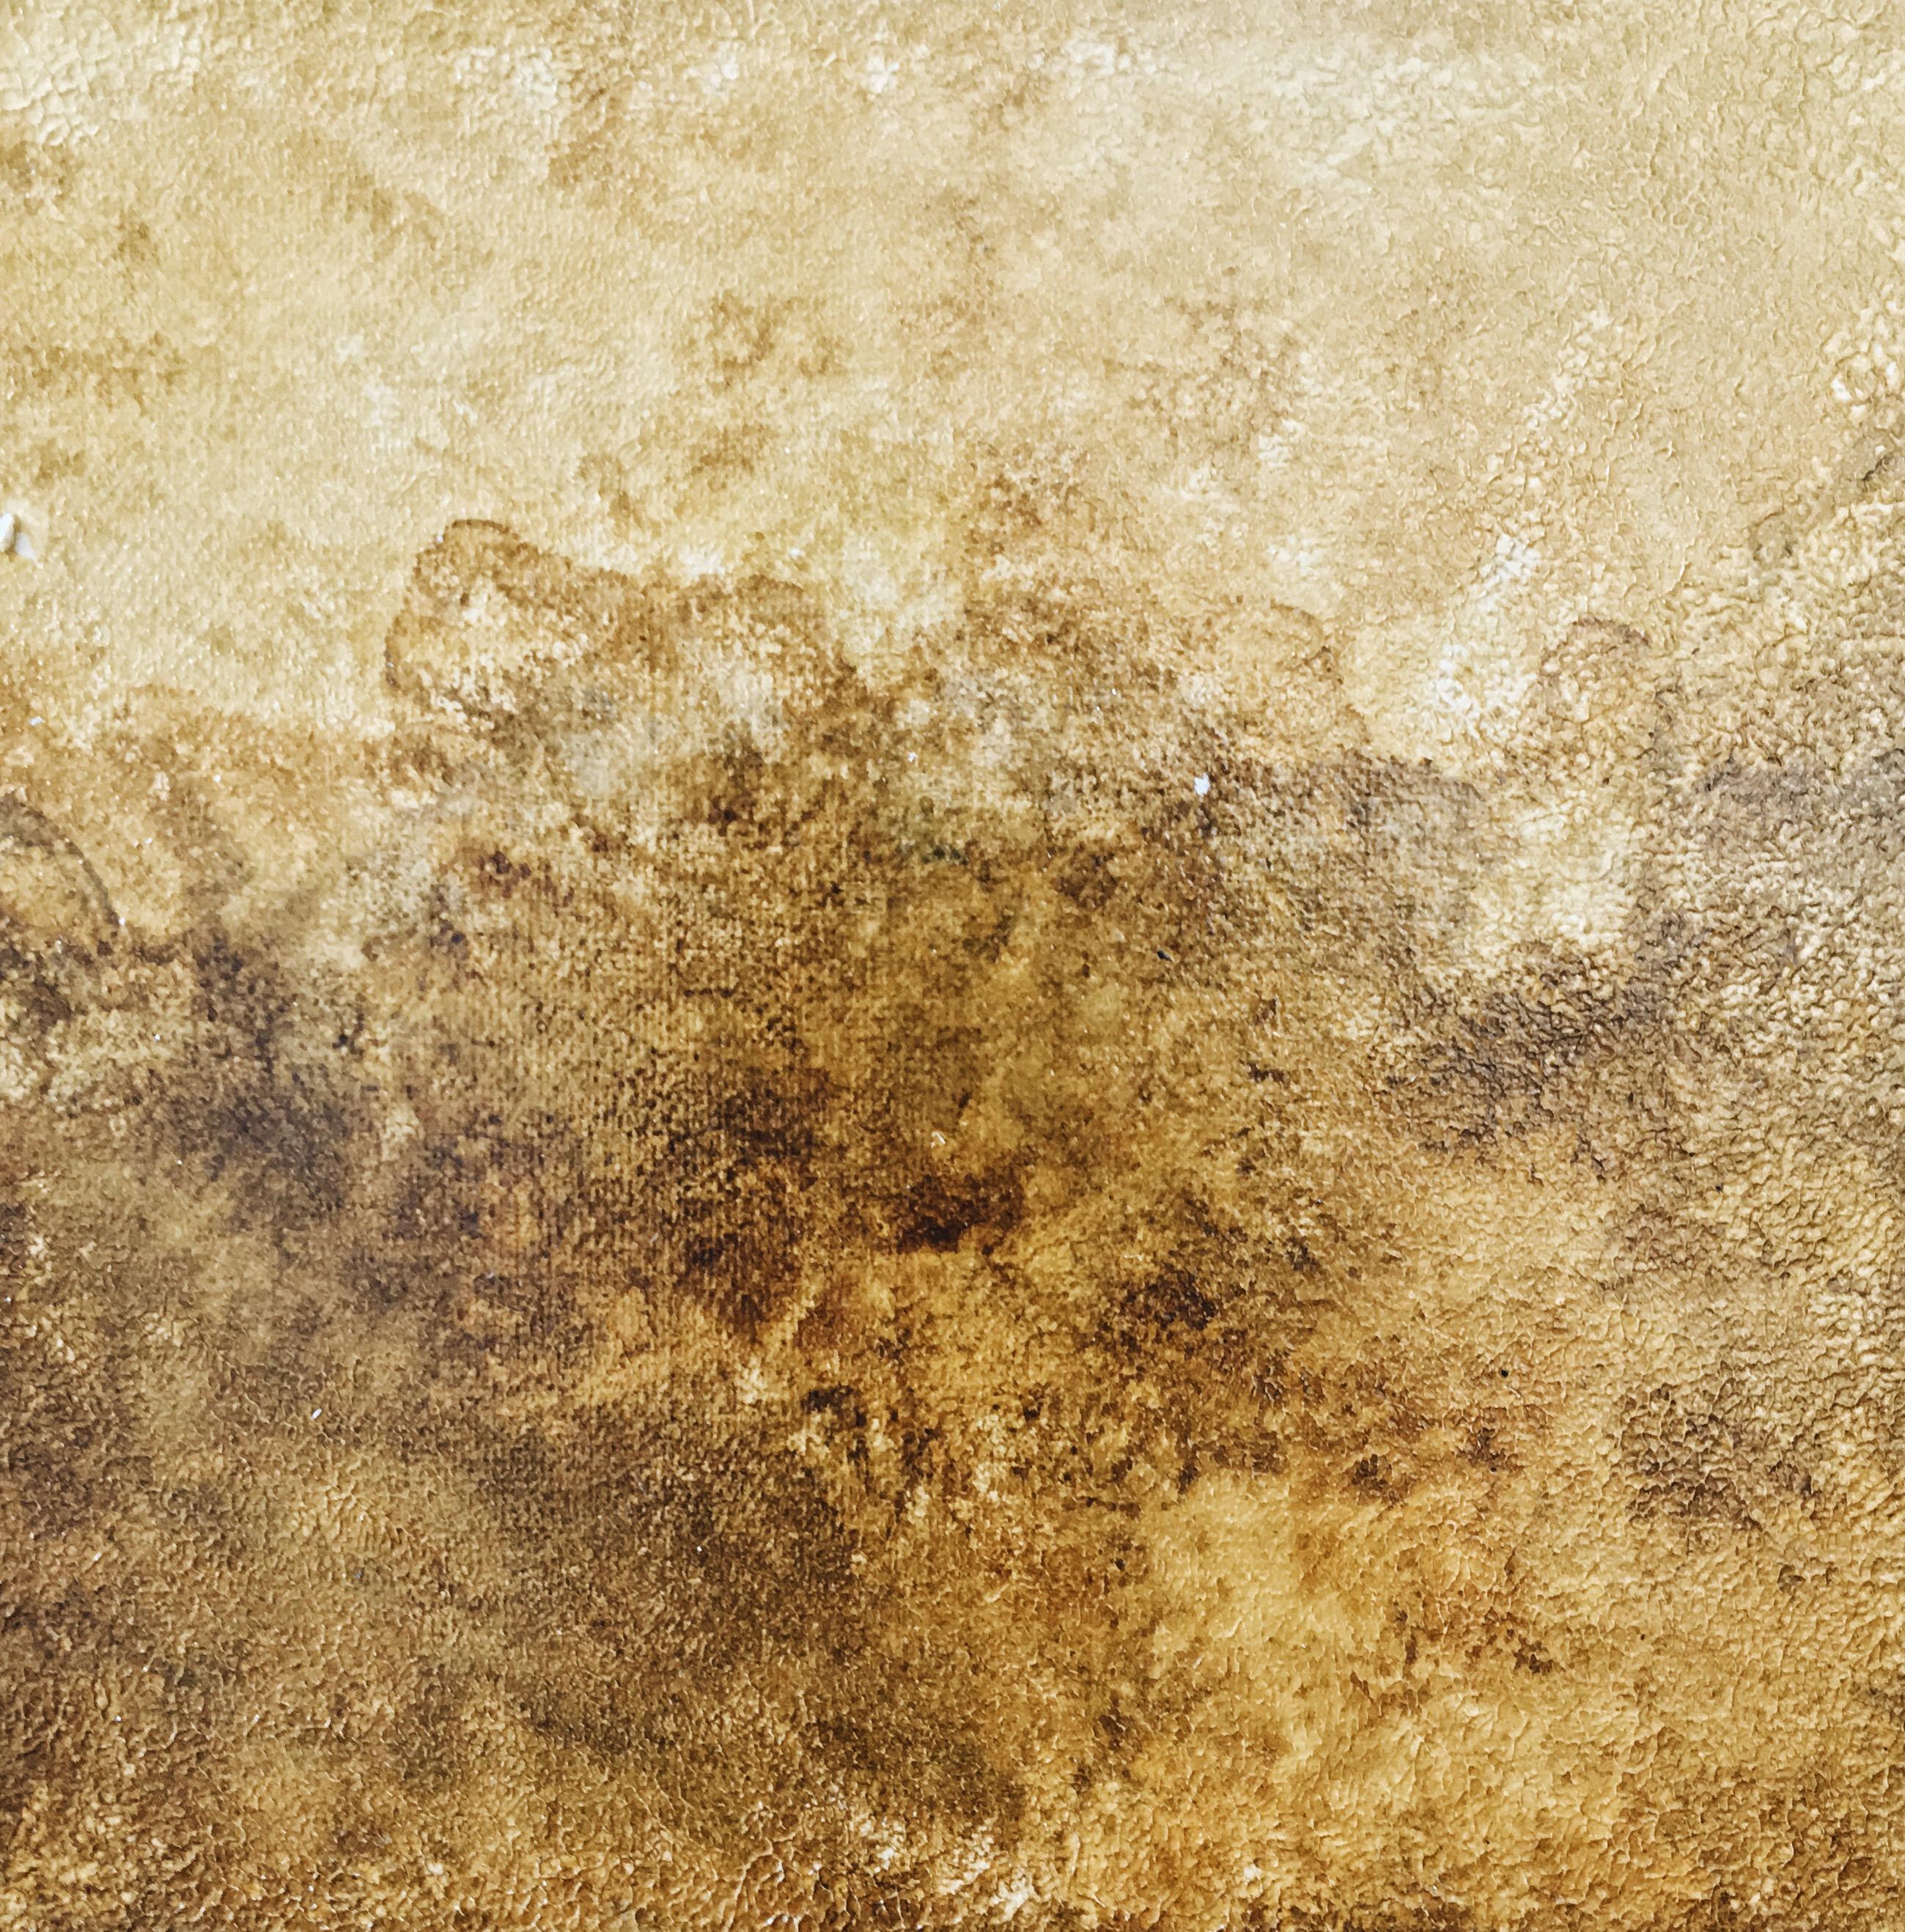 Marine Bonzom - Artiste Peintre Biarritz - 48